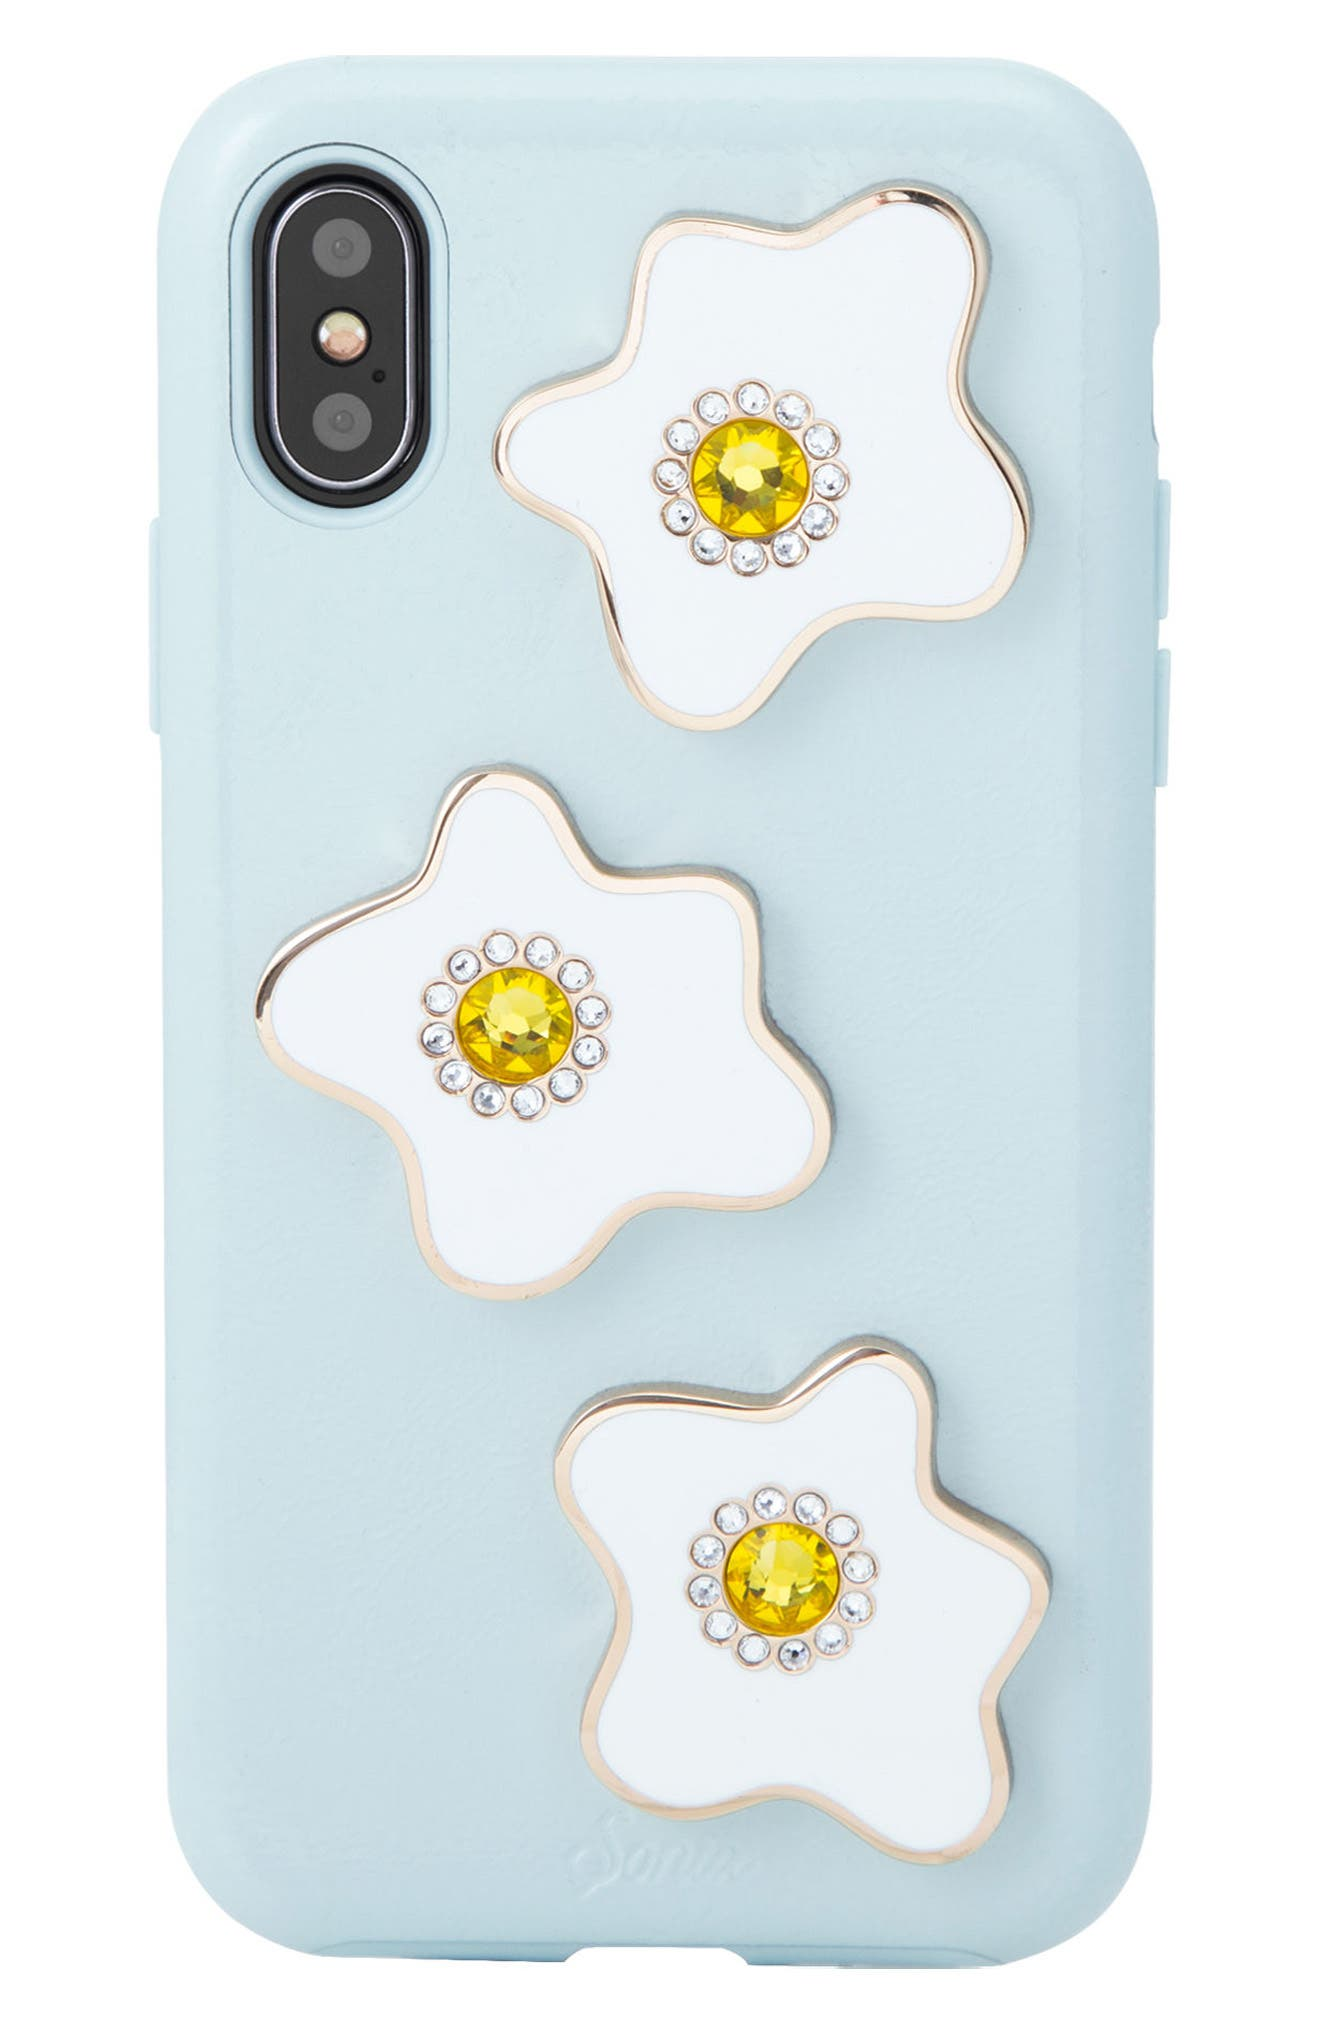 Eggy iPhone X Case,                             Main thumbnail 1, color,                             Blue/ White/ Yellow